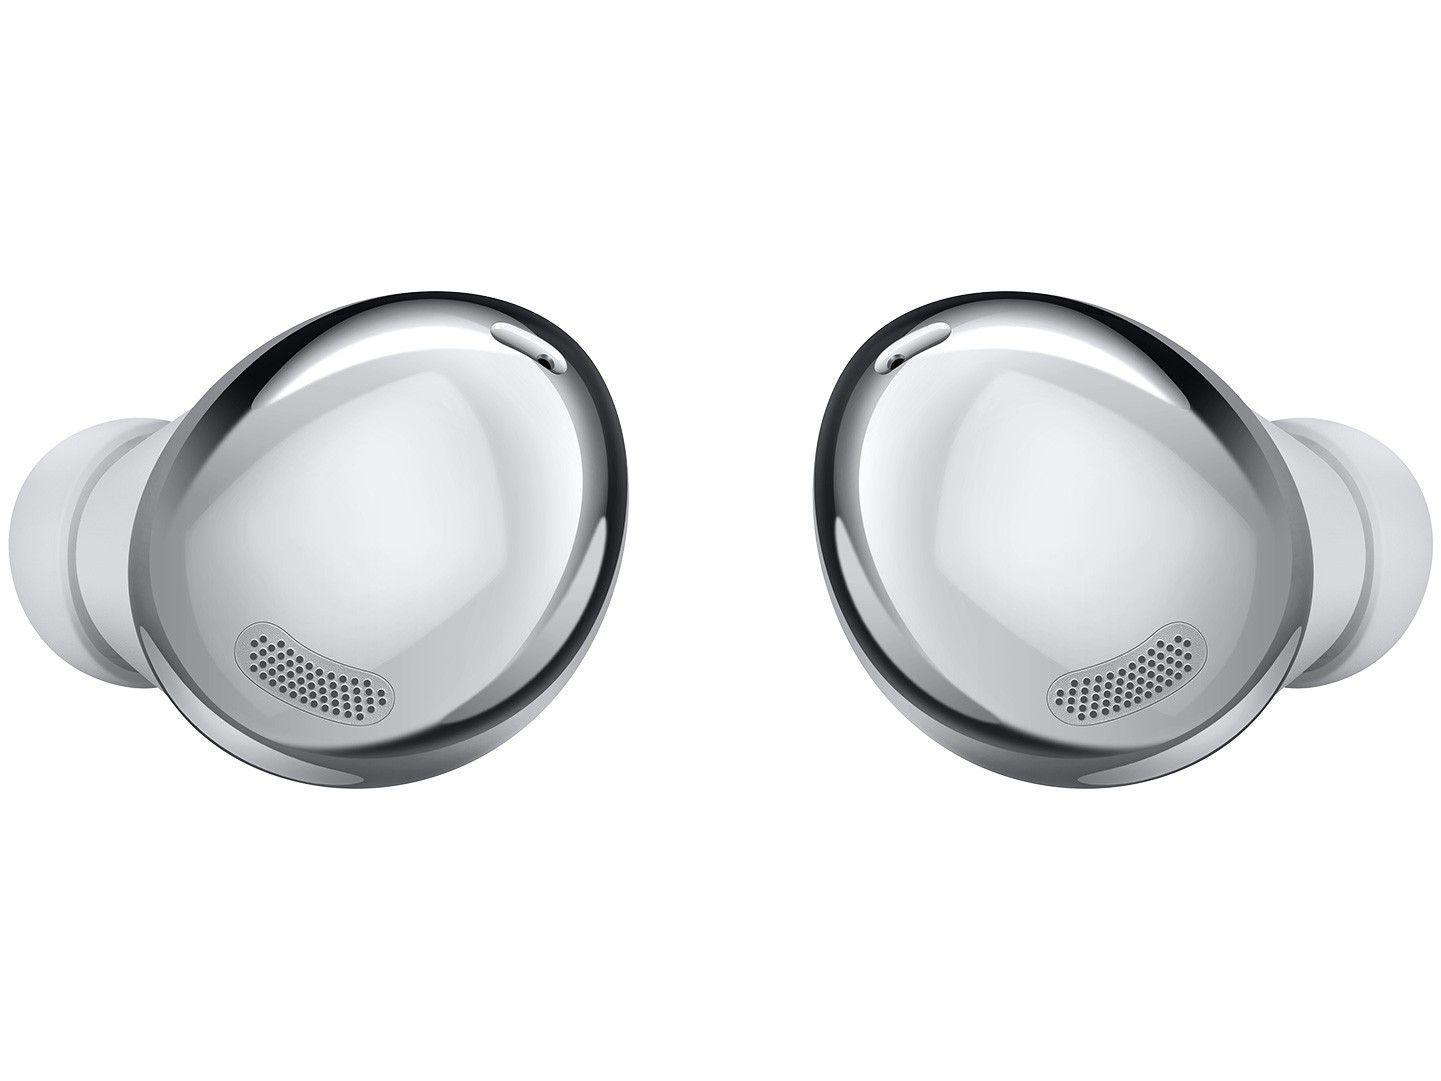 Fone de Ouvido Bluetooth Samsung Galaxy Buds Pro - Intra-auricular True Wireless com Microfone